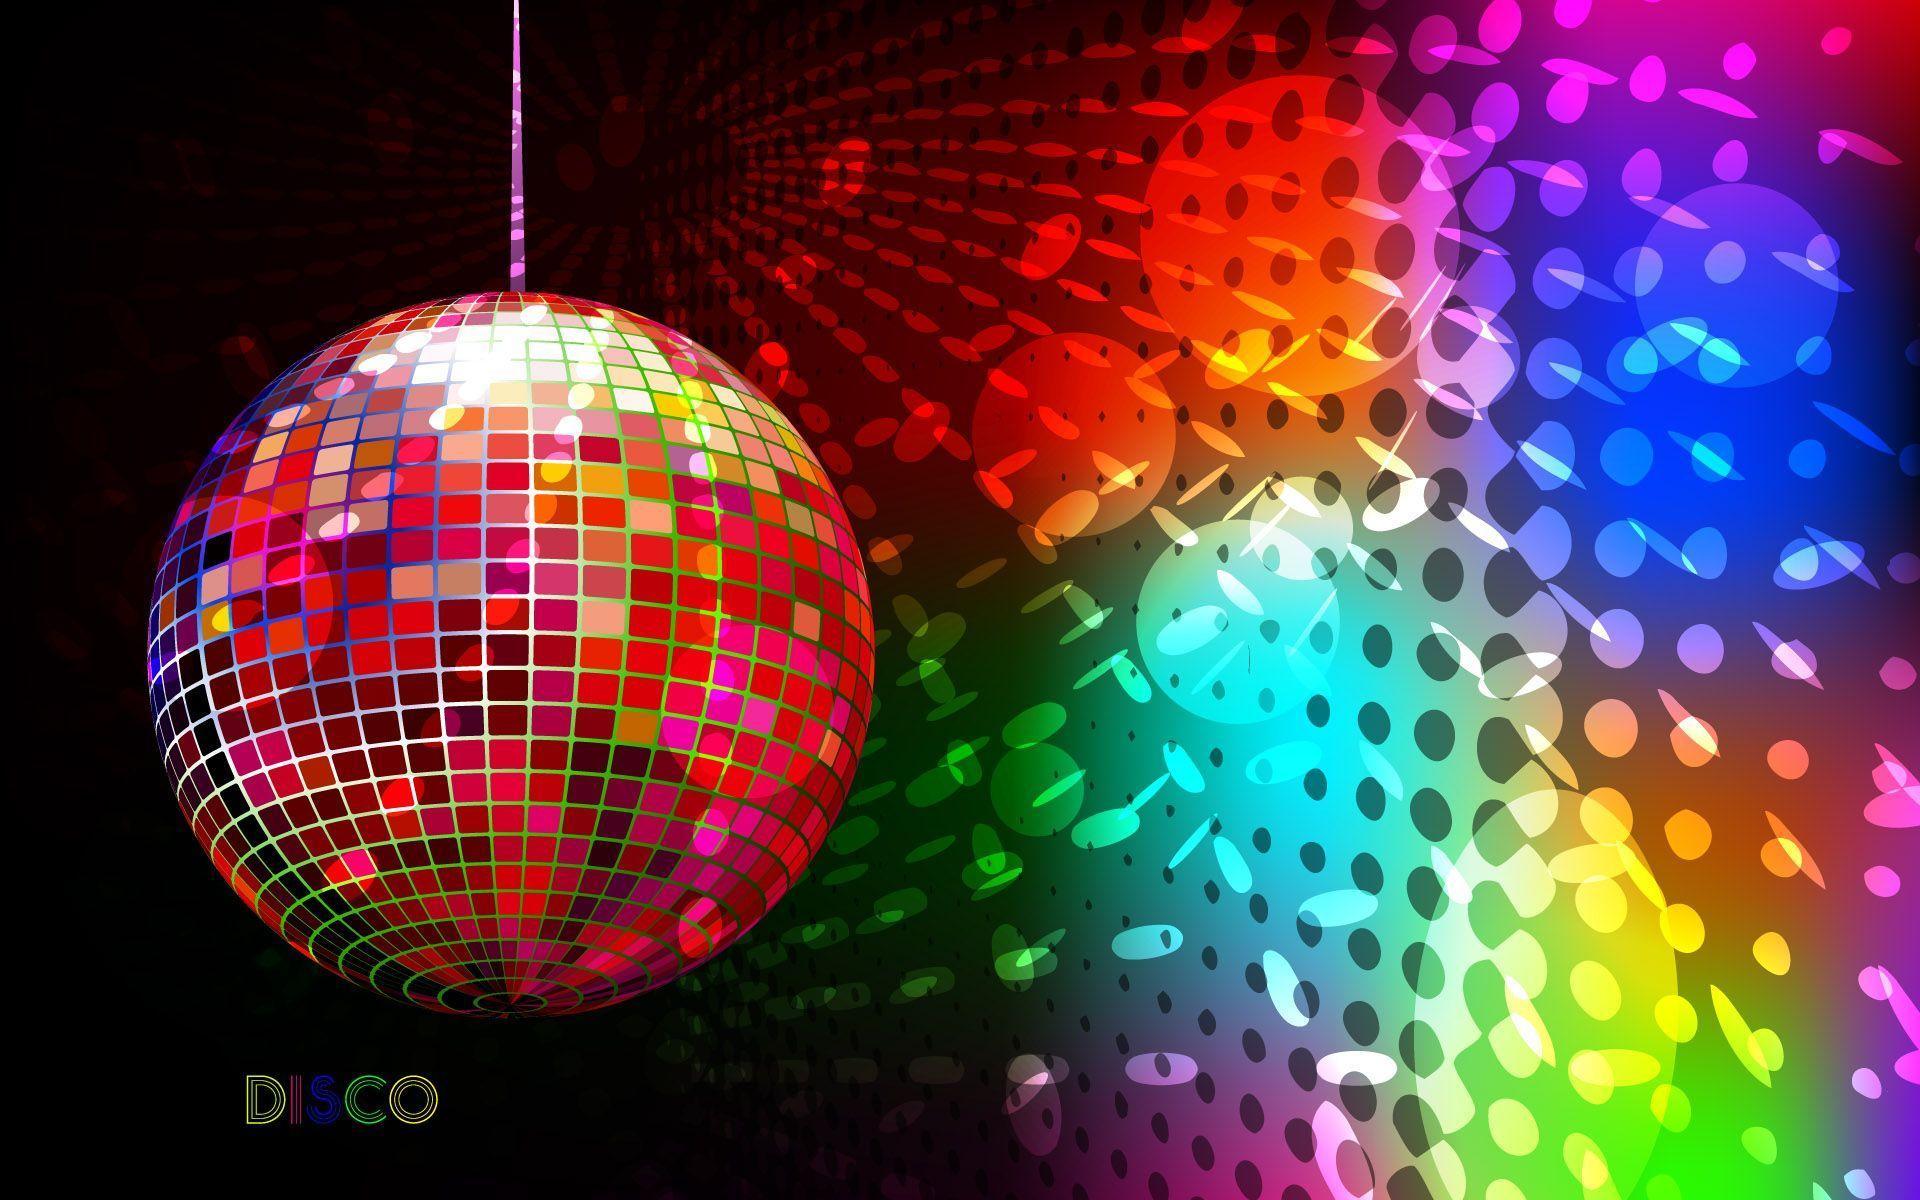 Disco Ball Wallpapers ...